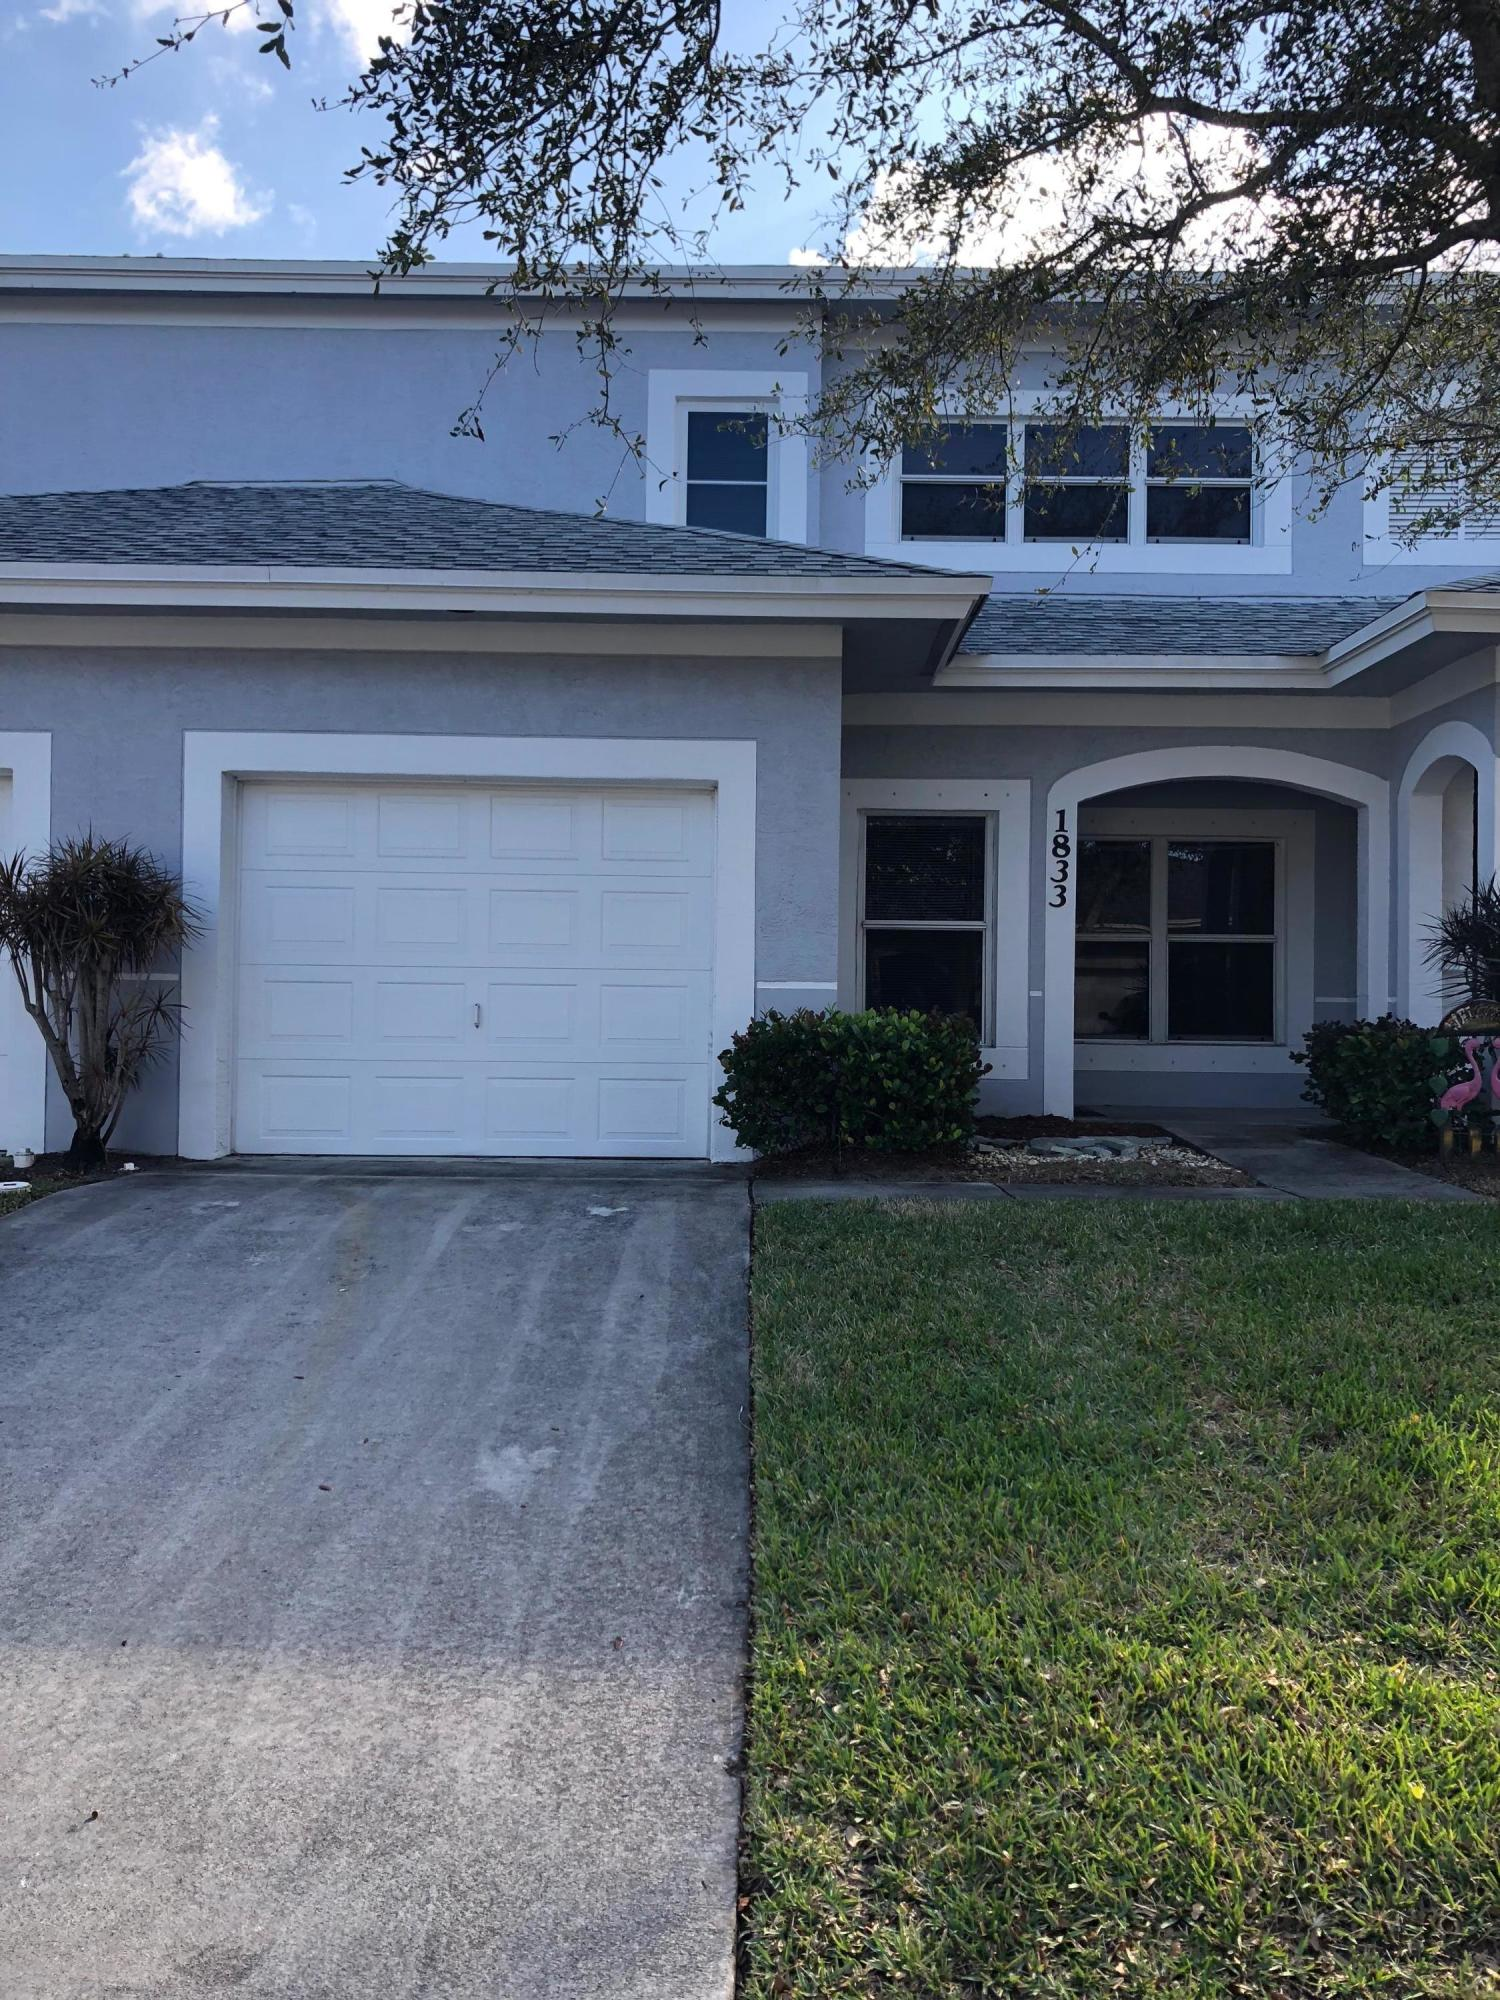 1833 Sandhill Crane Drive, Fort Pierce, FL 34982